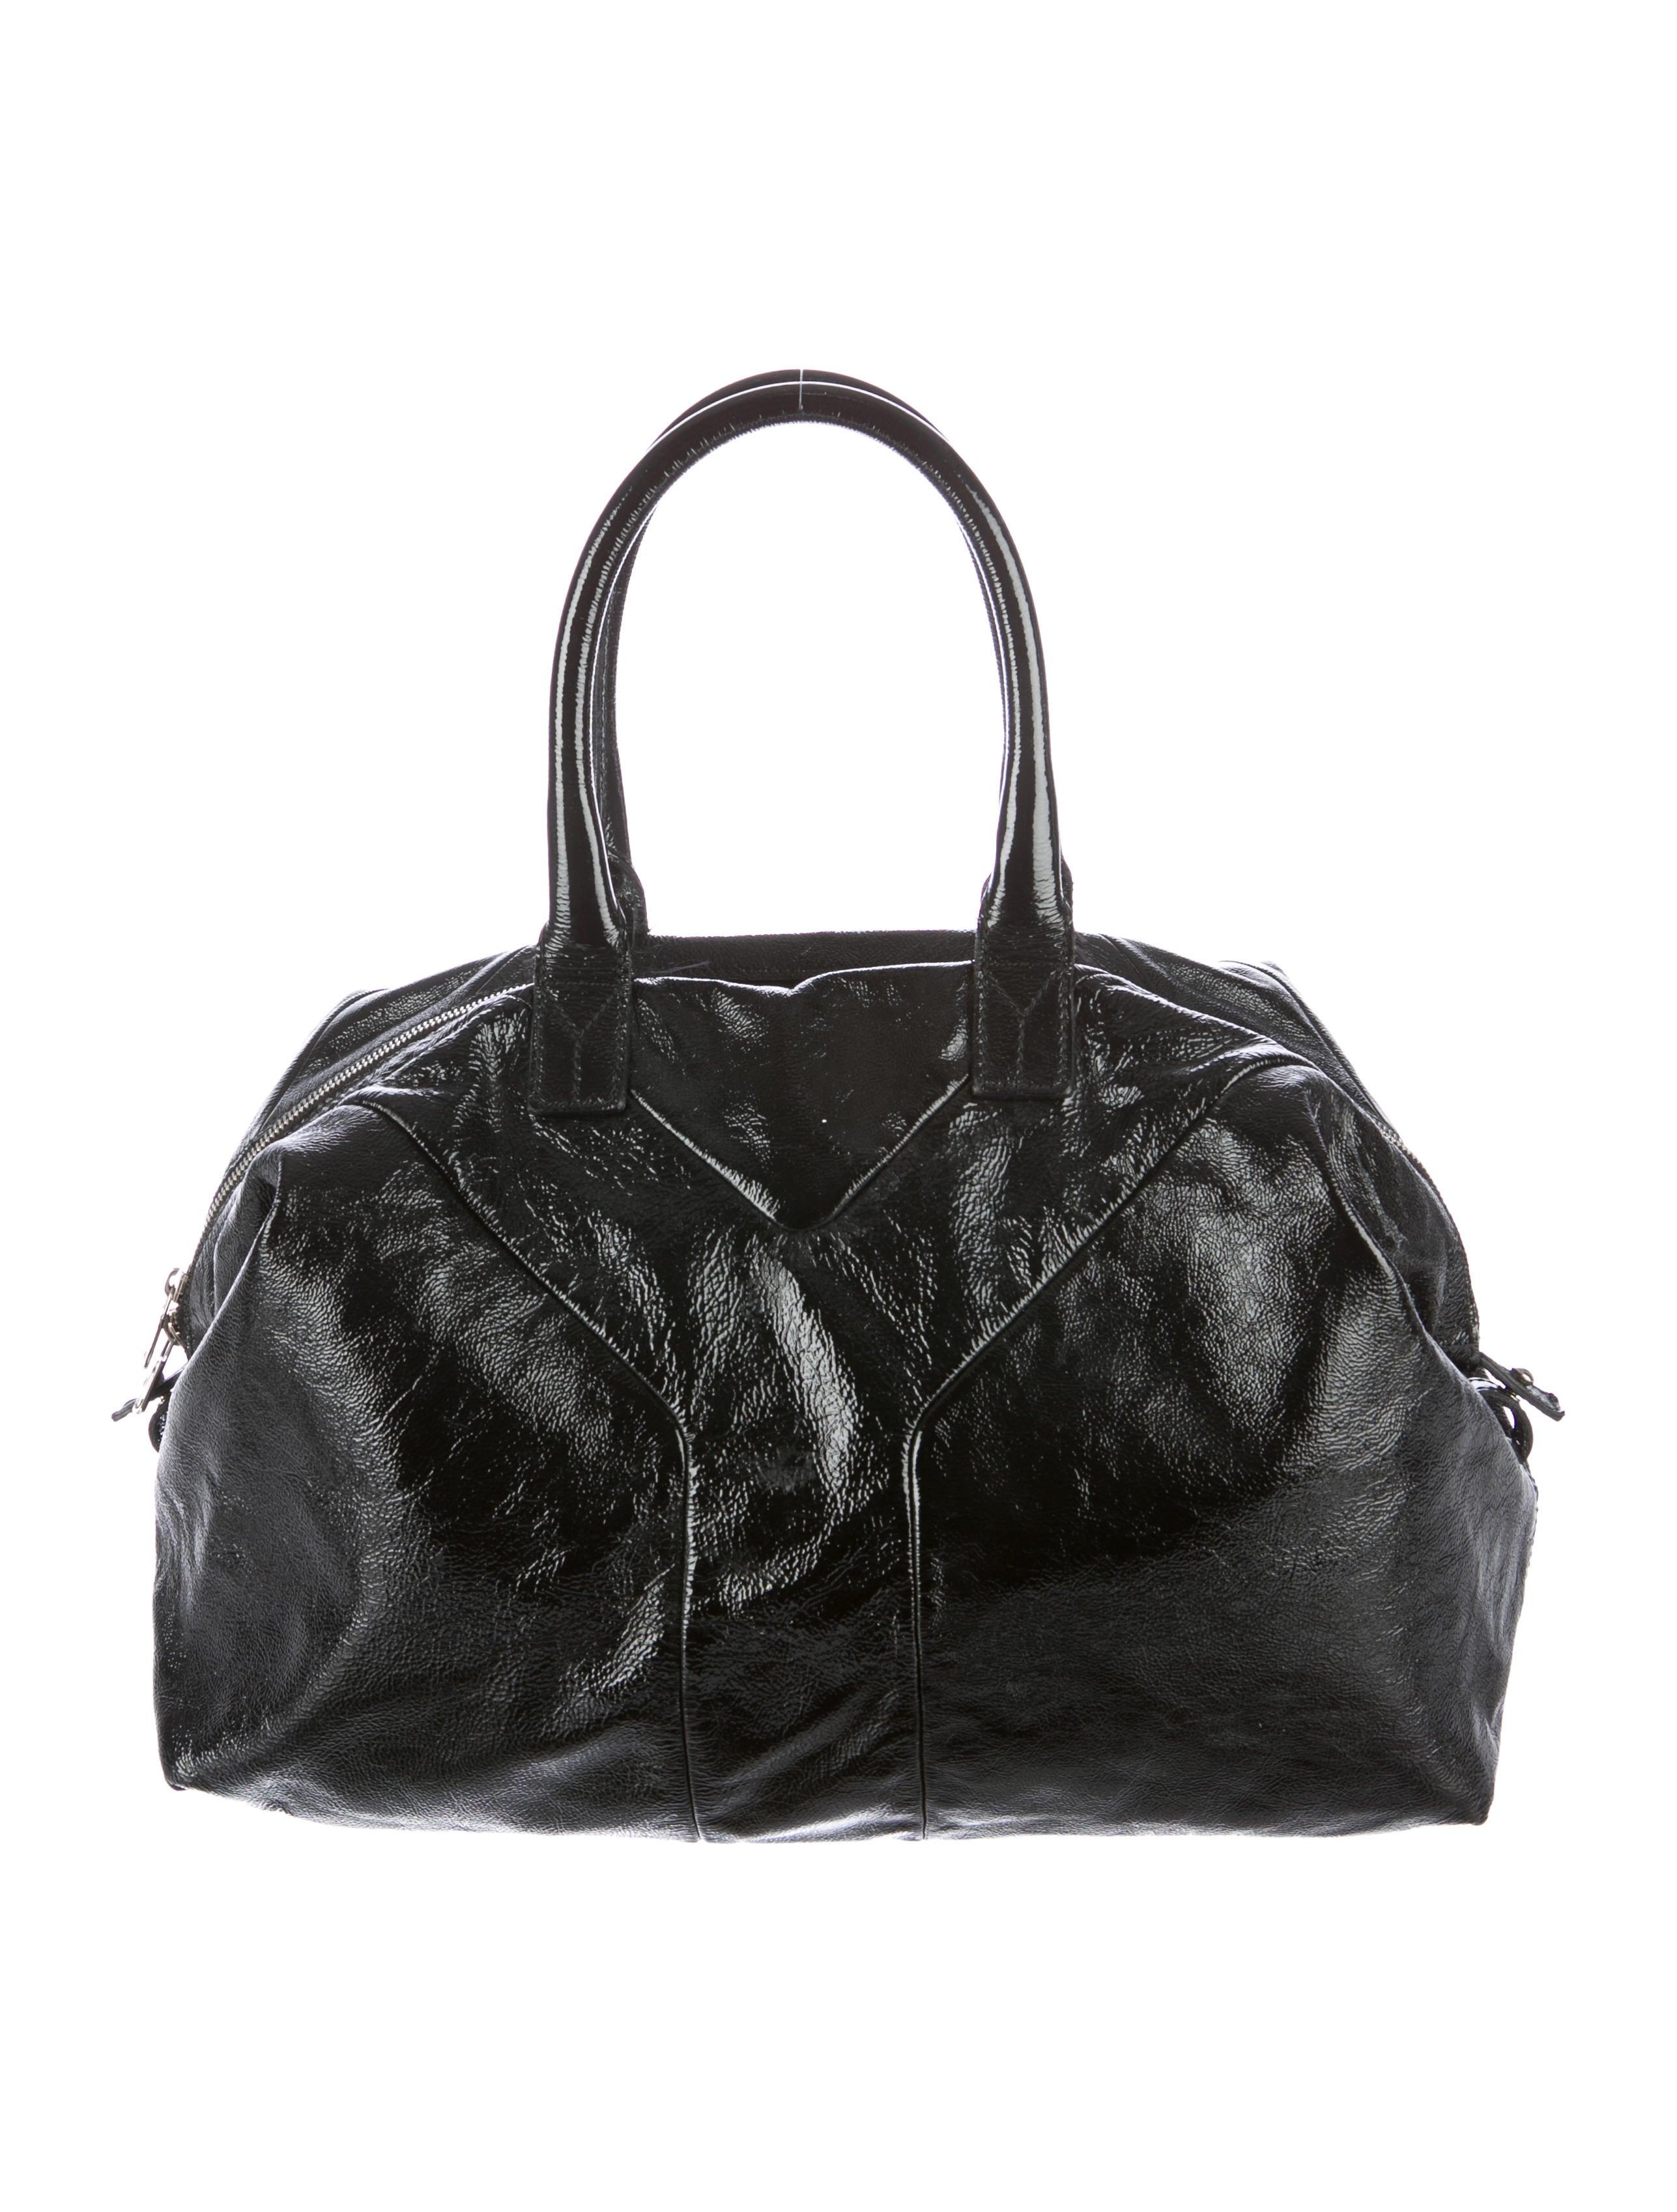 yves saint laurent wallets - Yves Saint Laurent Easy Bag - Handbags - YVE38525 | The RealReal